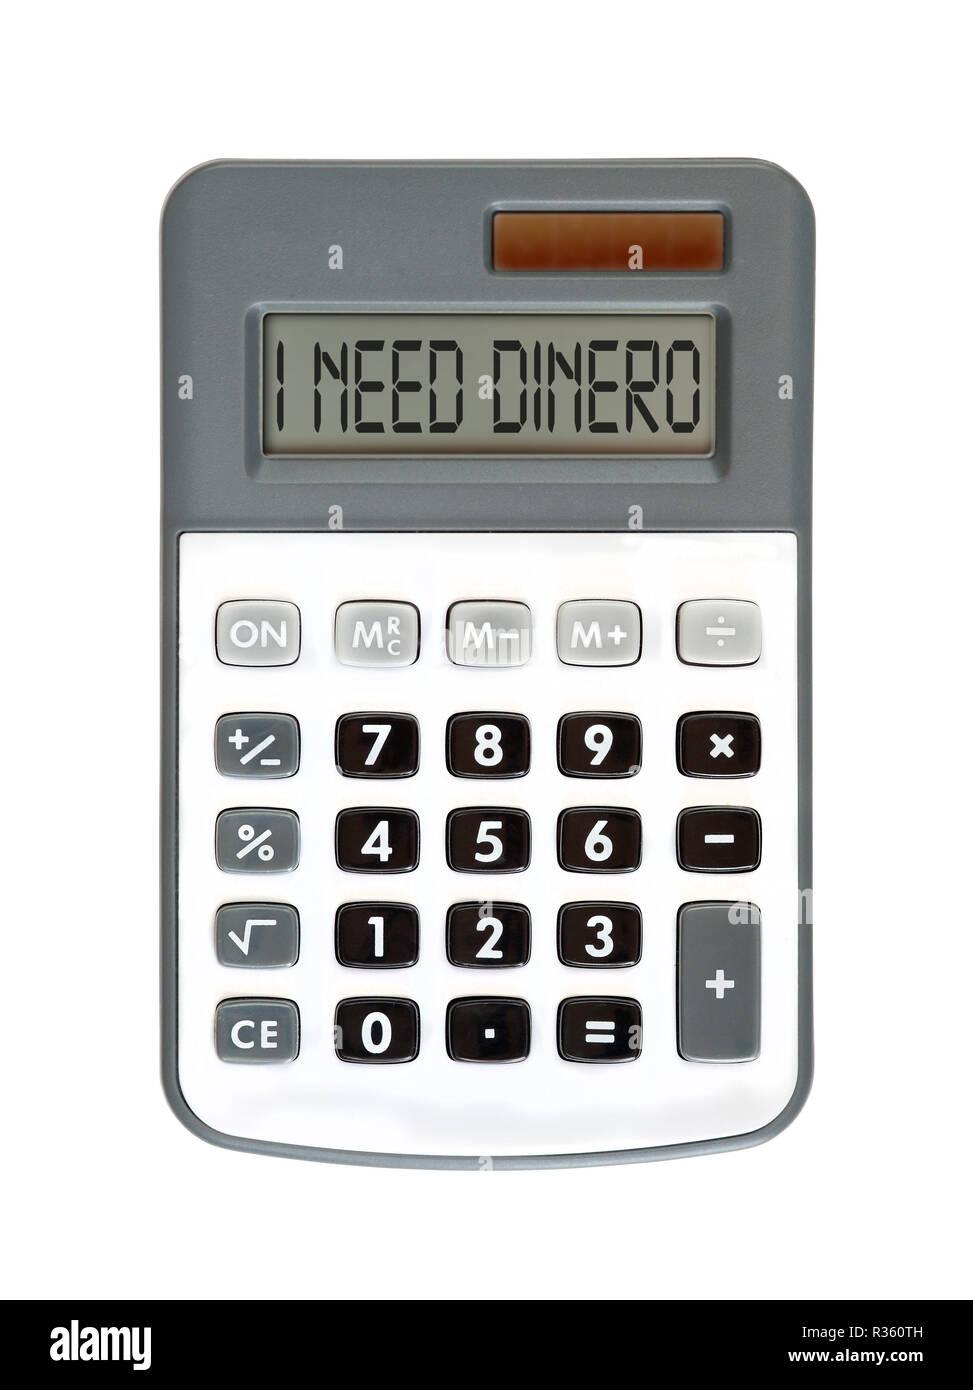 I need dinero - Stock Image